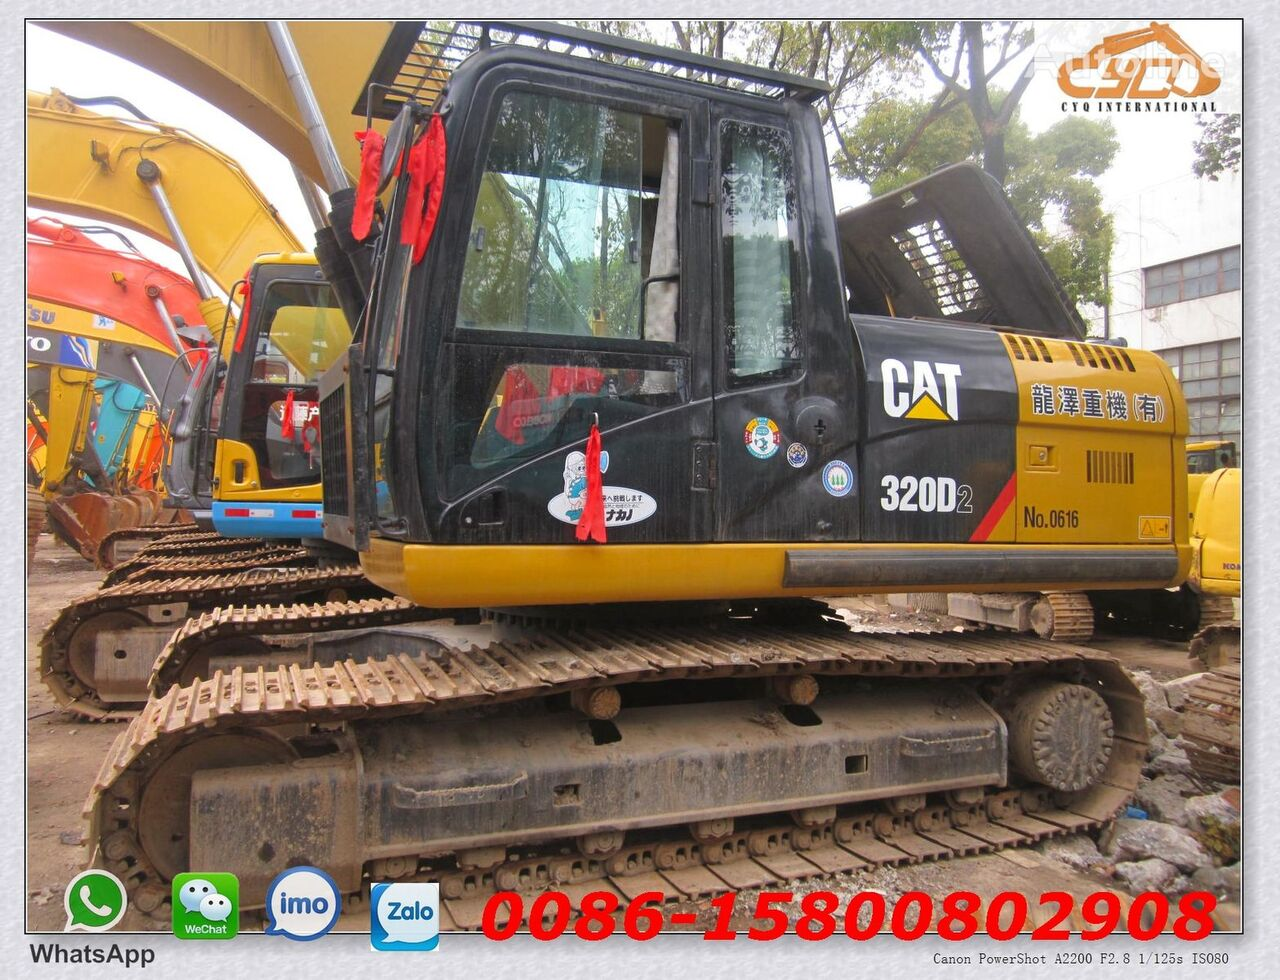 CATERPILLAR 320D2 tracked excavator